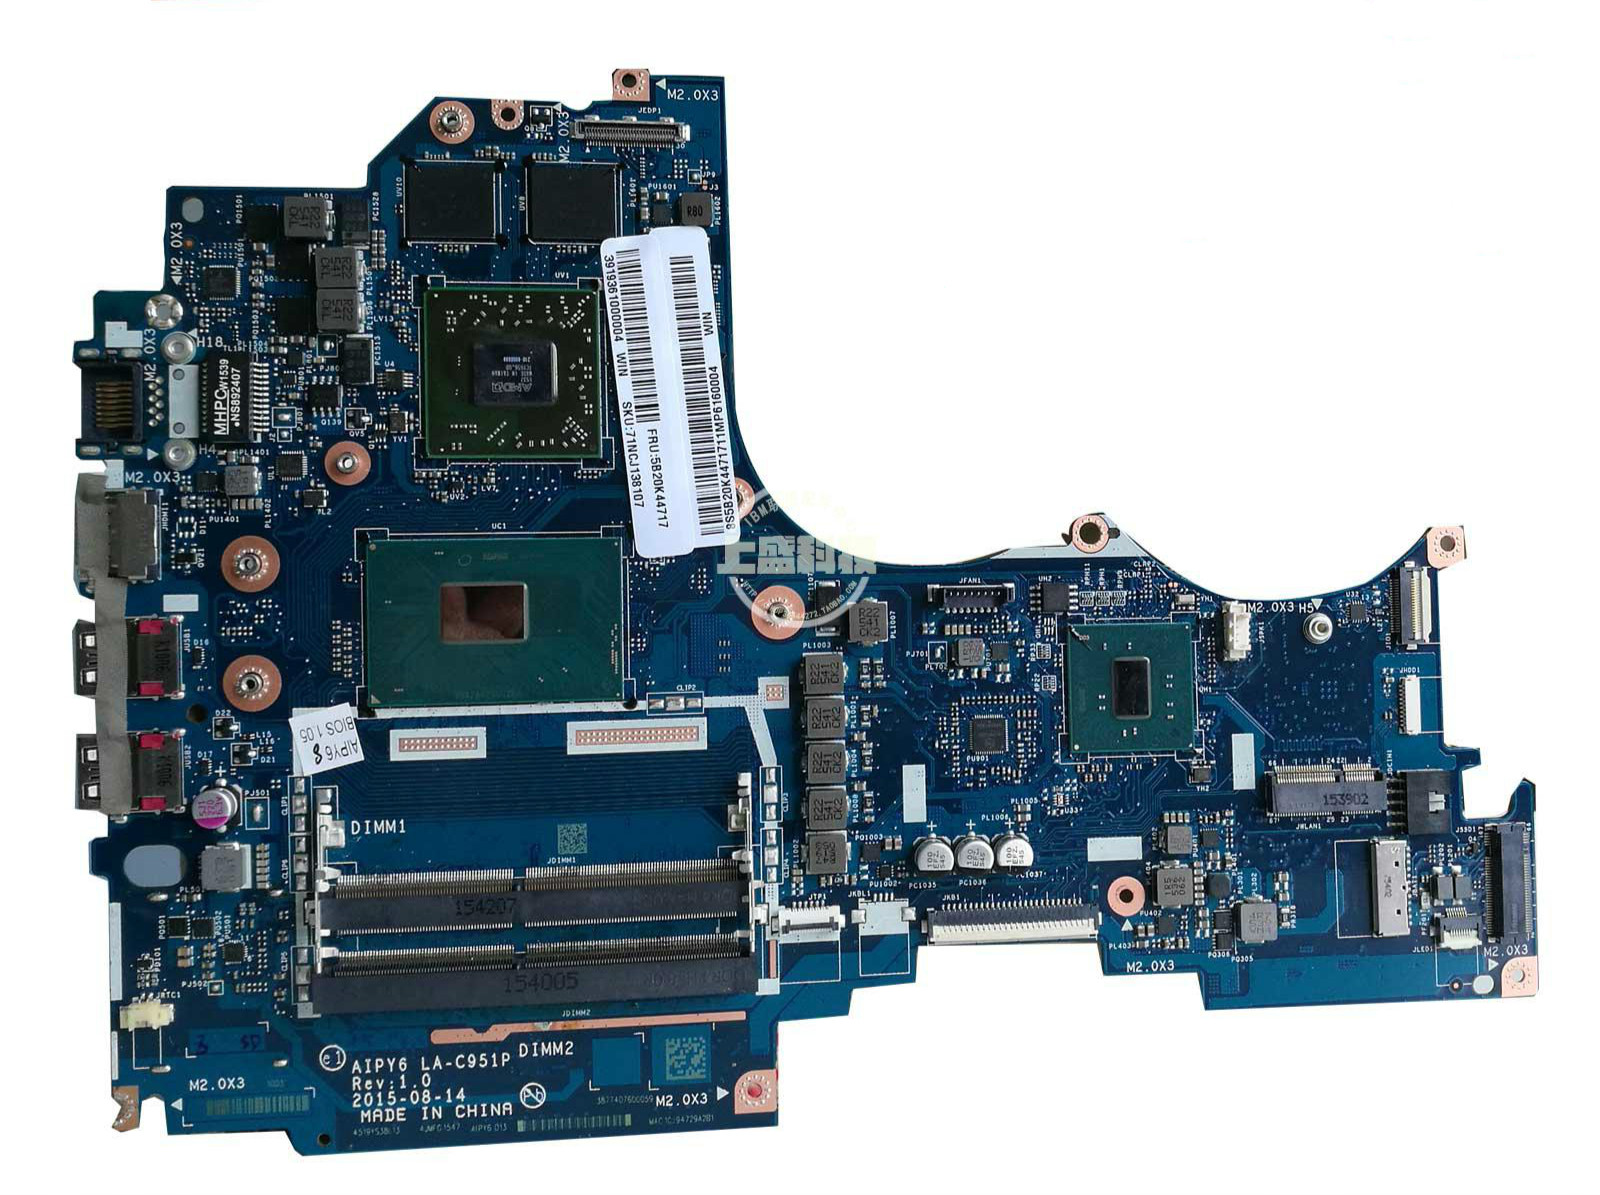 Lenovo Ideapad Y700-14ISK Laptop Motherboard 14 inch 5B20M55518 AIPY6  LA-C951P SR2FQ i7-6700HQ Radeon R9 M375 4GB